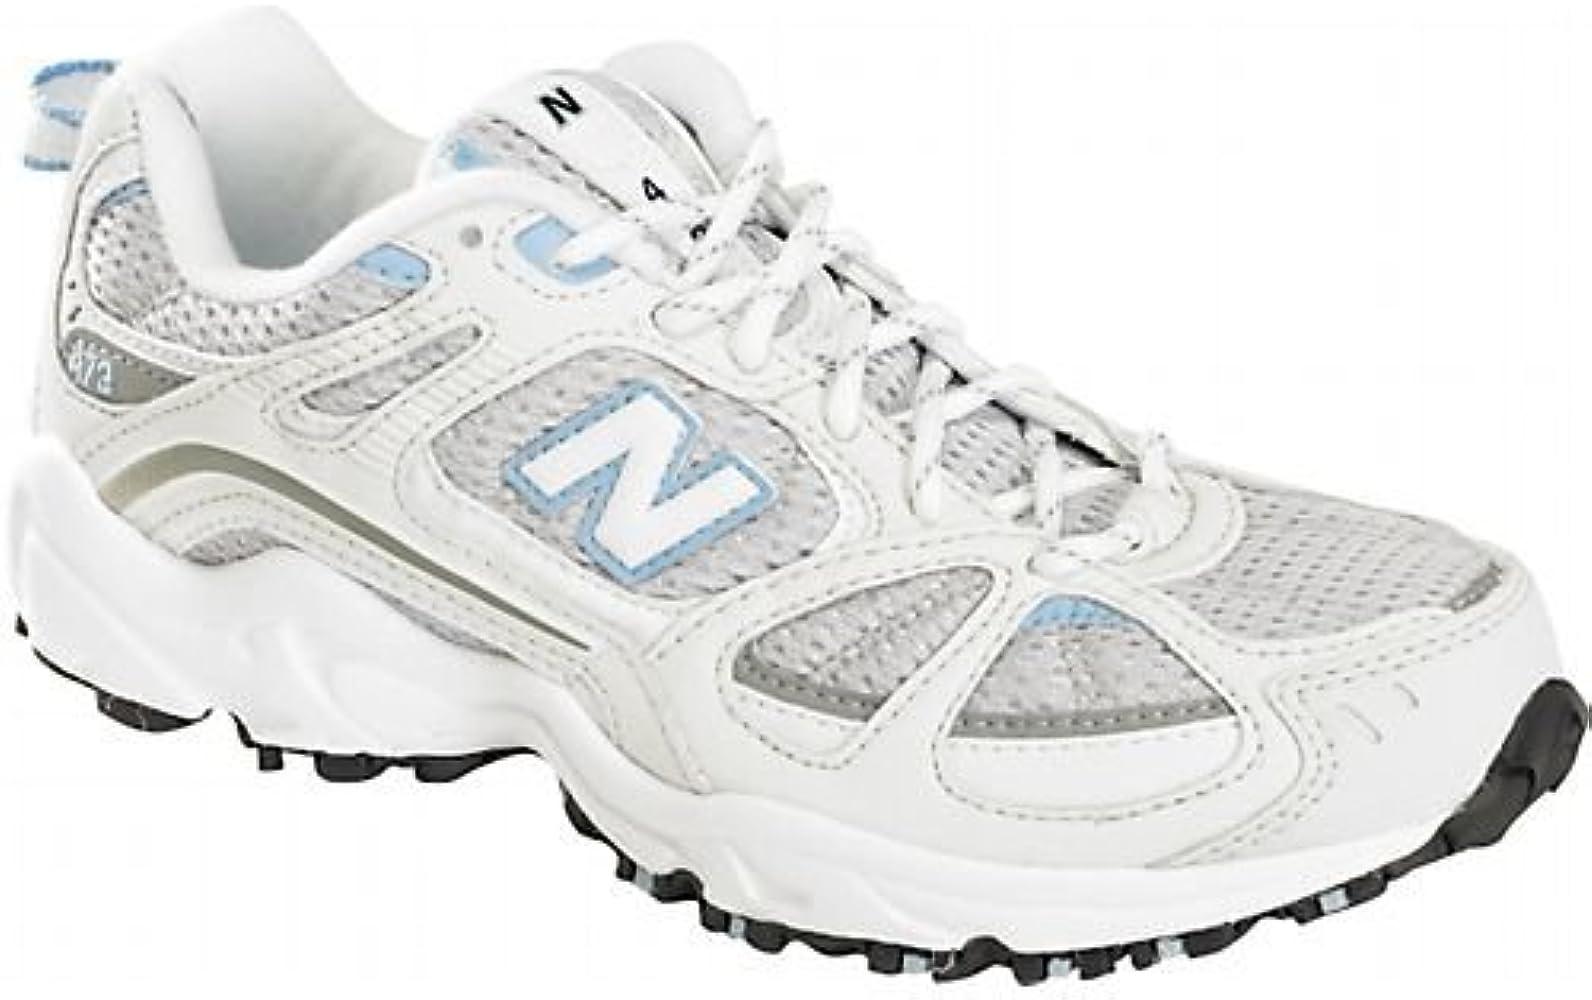 Amazon.com: New Balance 473 Running Wht : Clothing, Shoes & Jewelry